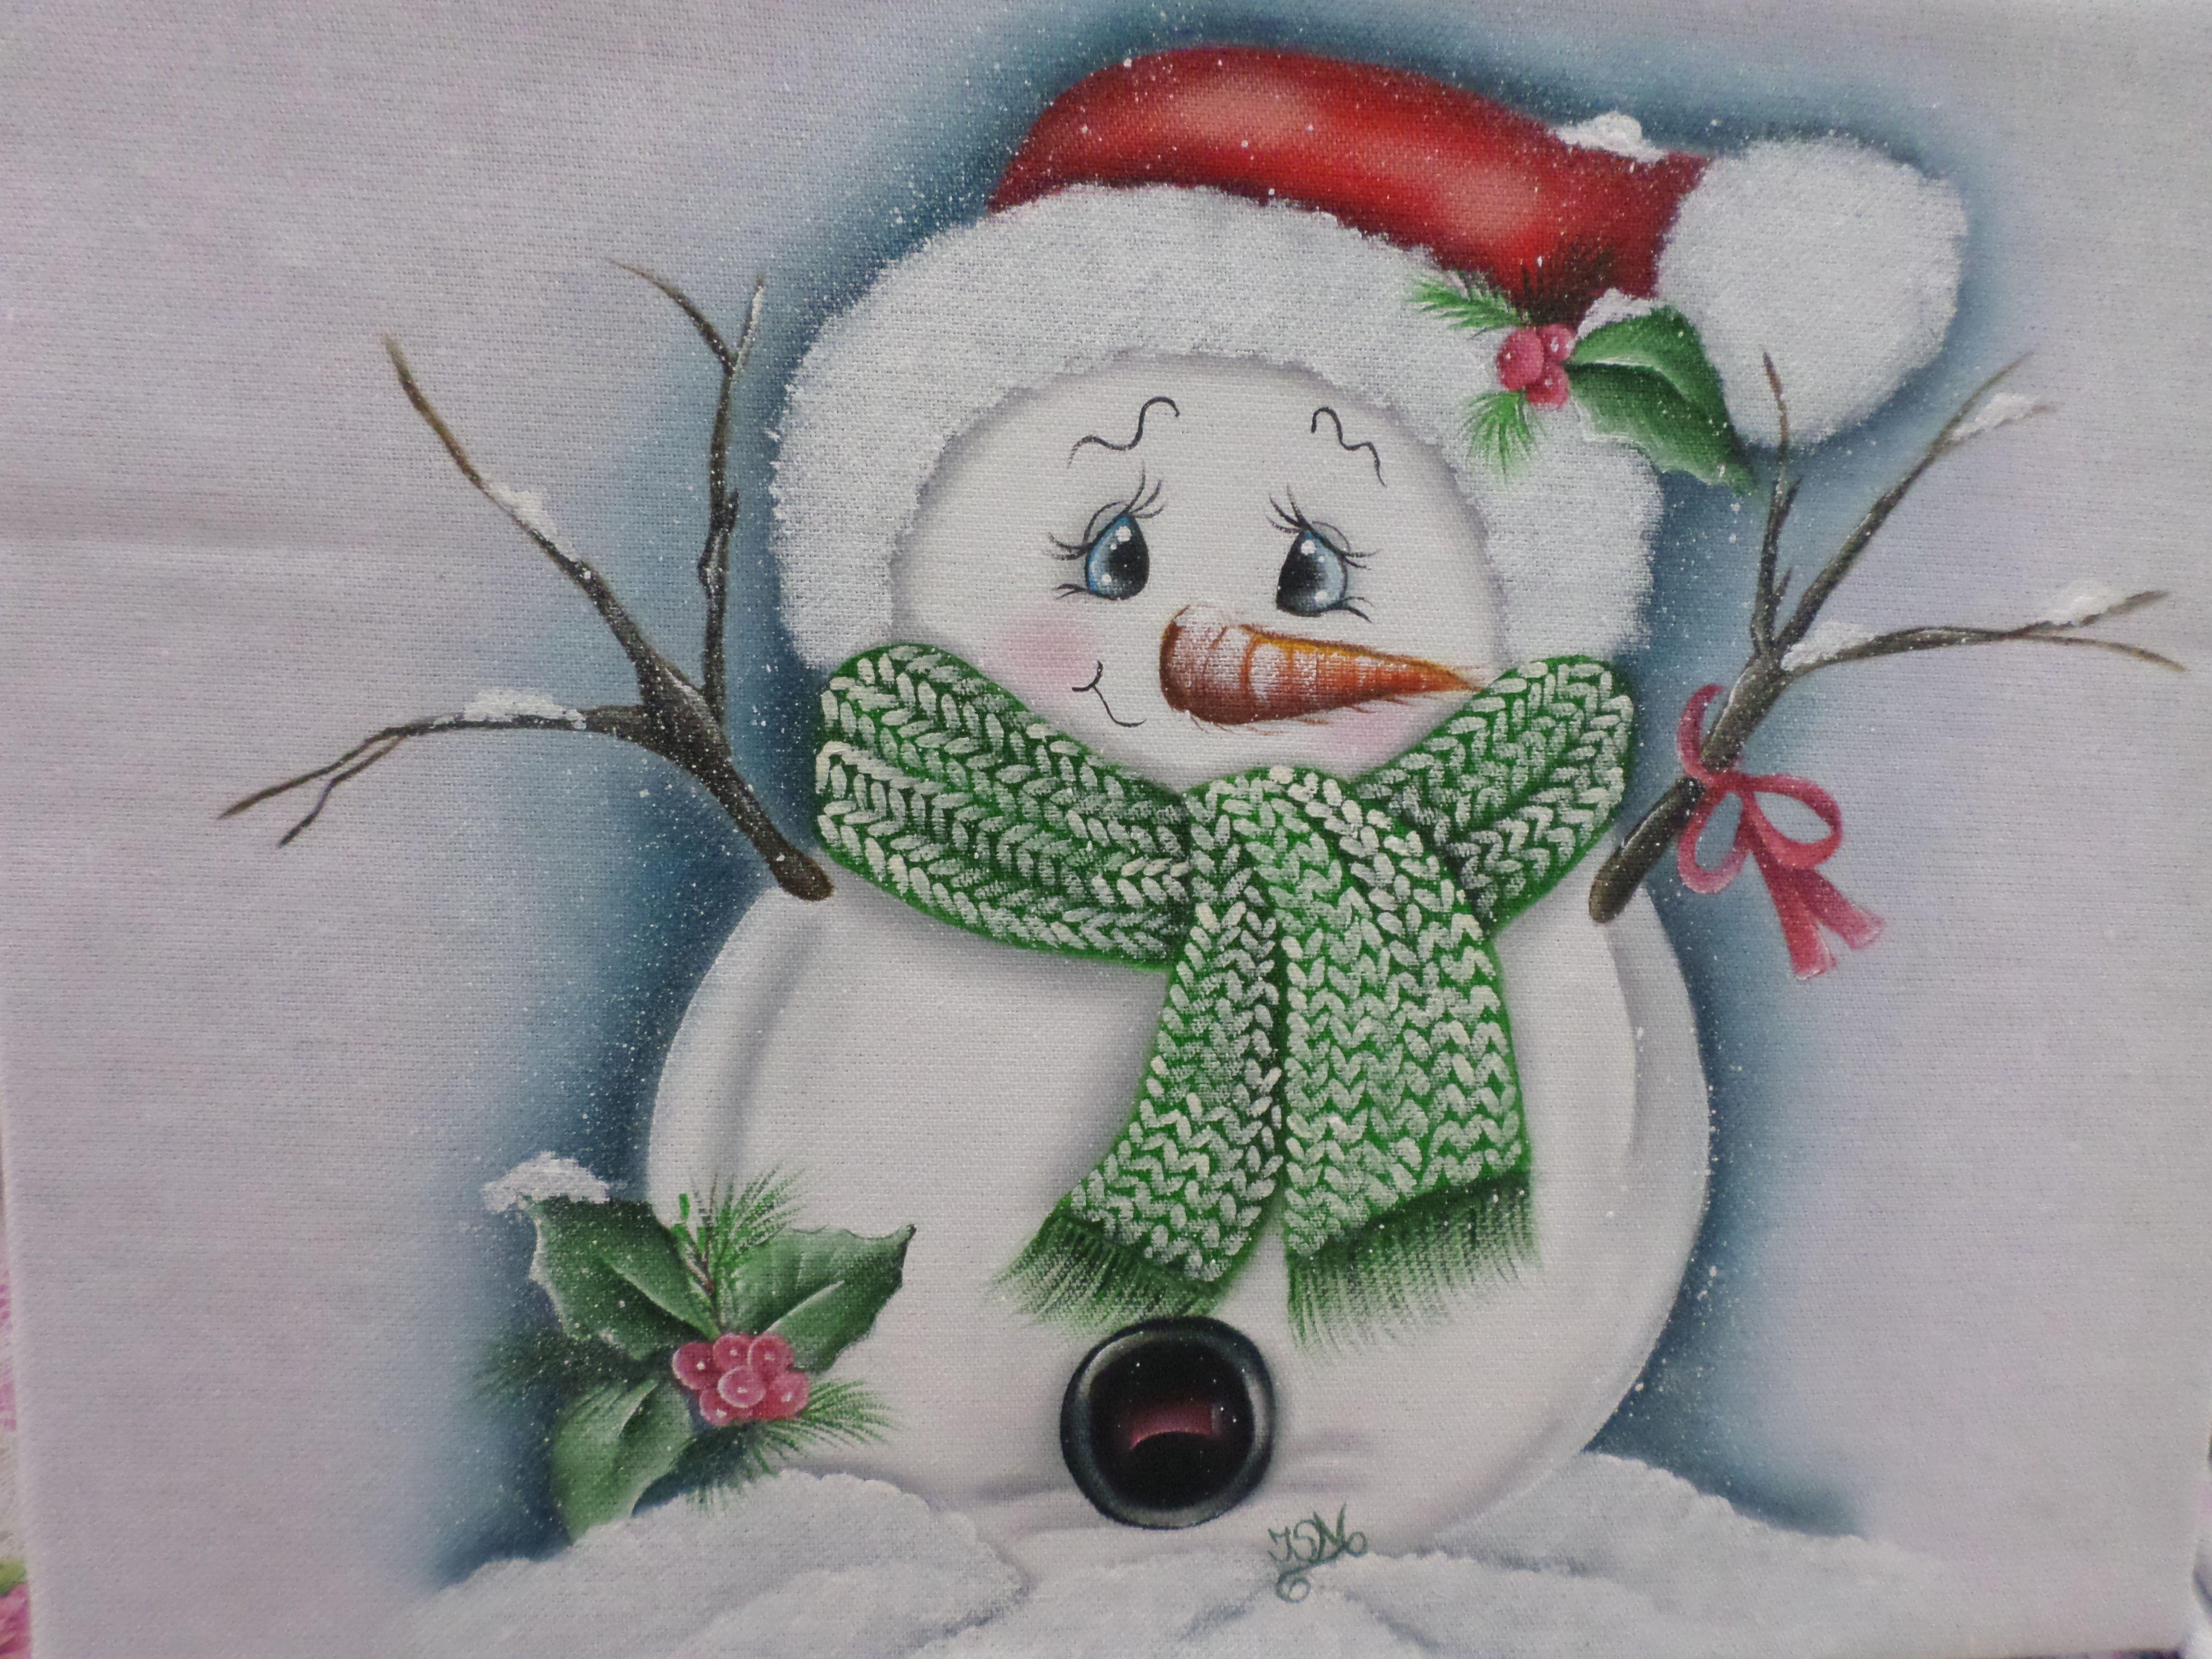 Ivanildartes versatilidade pinturas de navidad - Motivos navidenos para pintar en tela ...